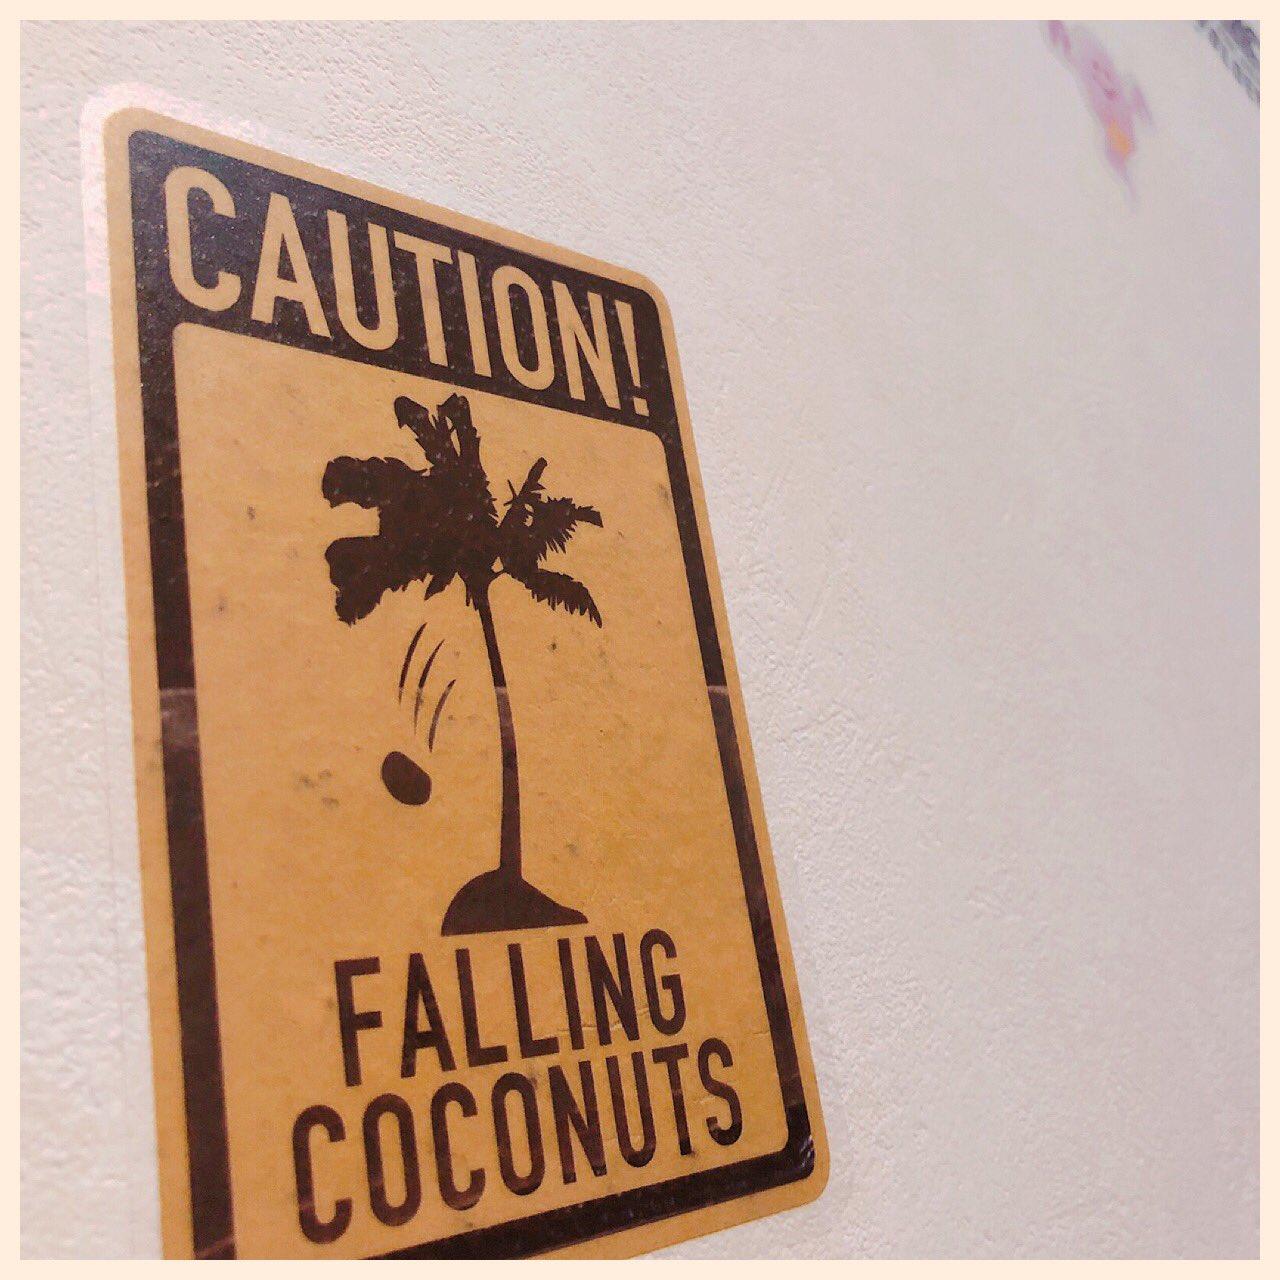 Falling coconuts https://t.co/DMwJcox5Cp